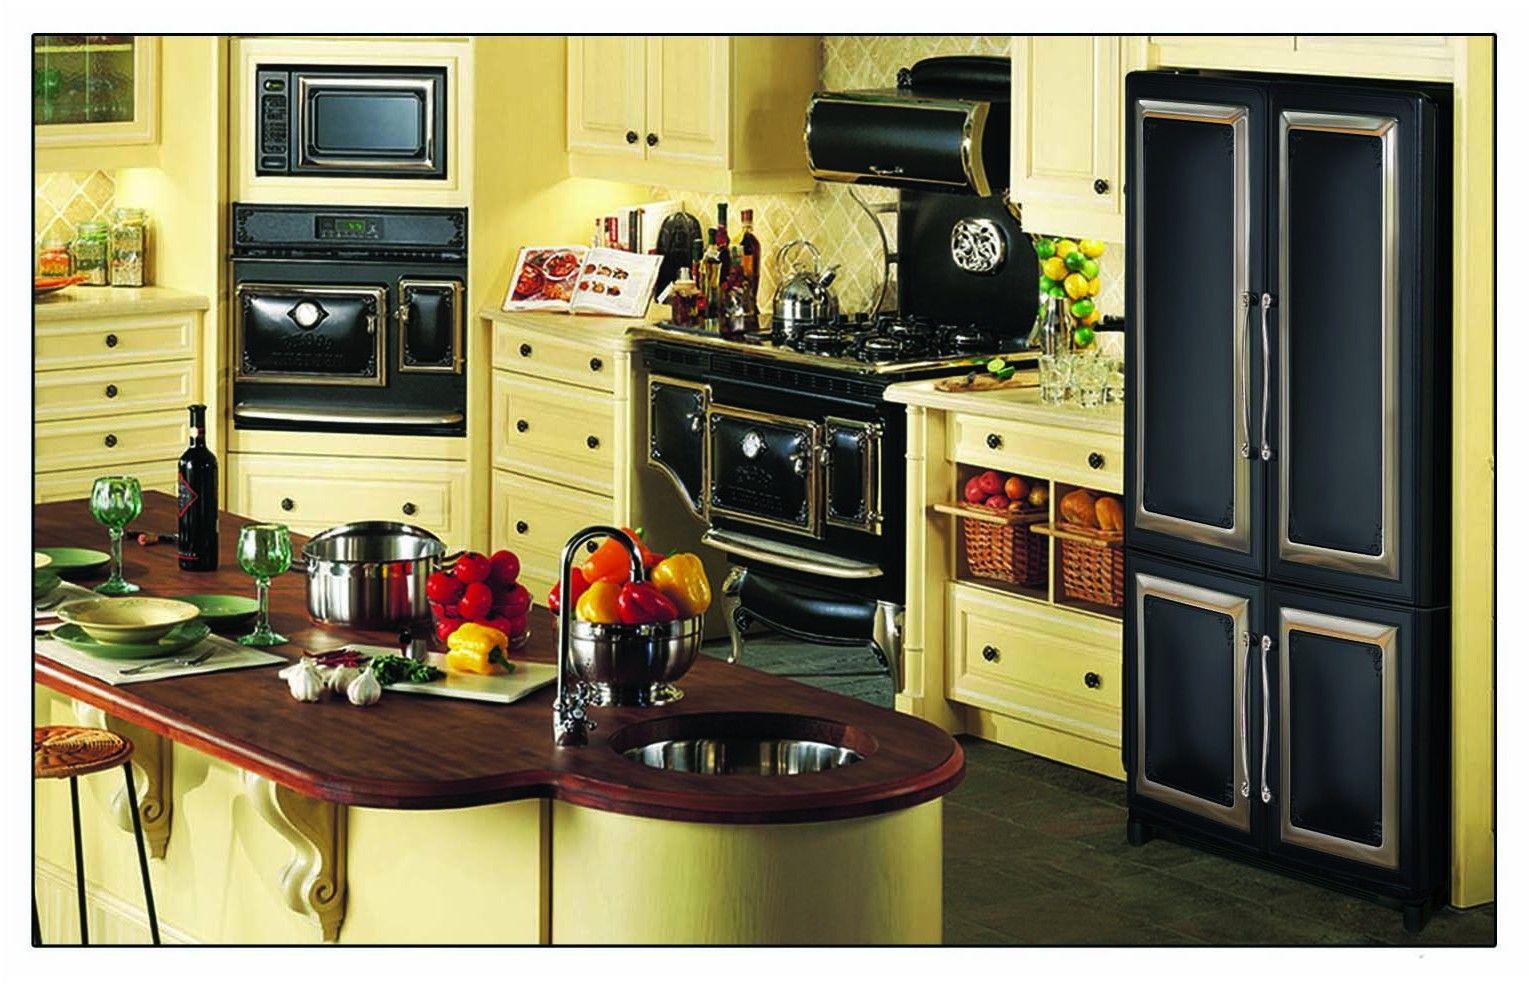 antique appliances elmira stove works from Antique Kitchen ...